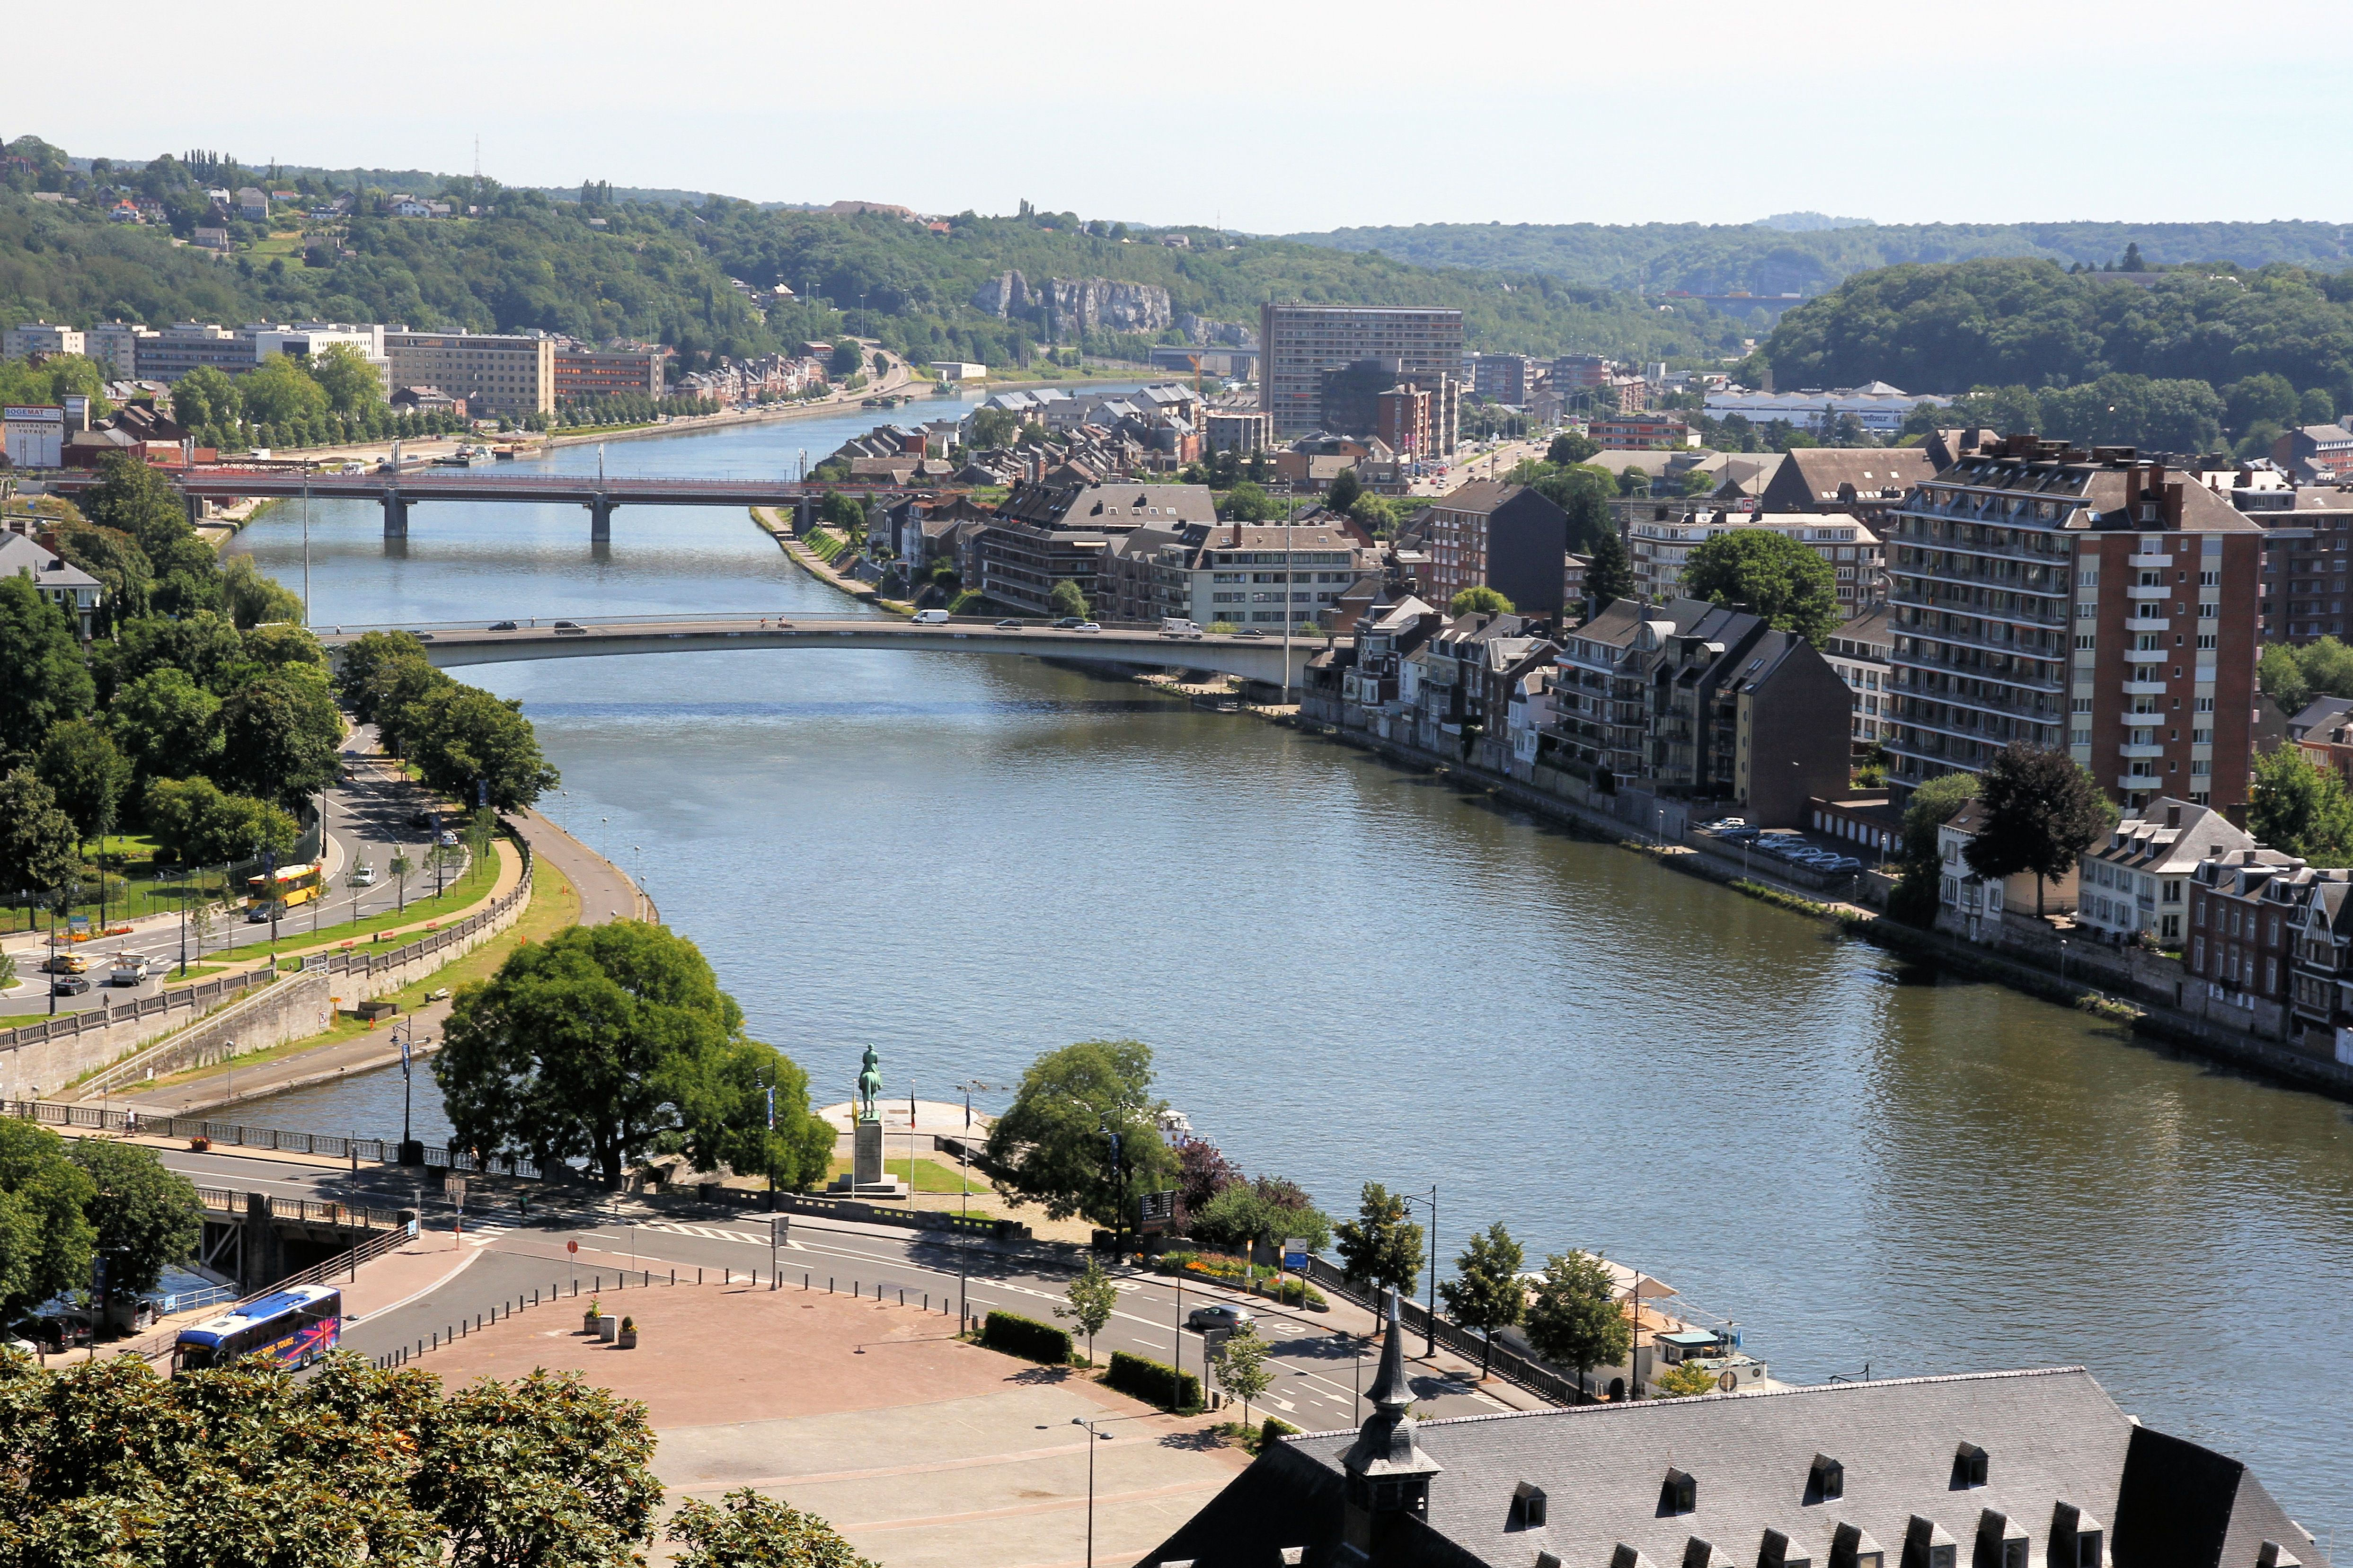 Confluent, where river the Sambre (left) meets river the Meuse in Namur, Belgium